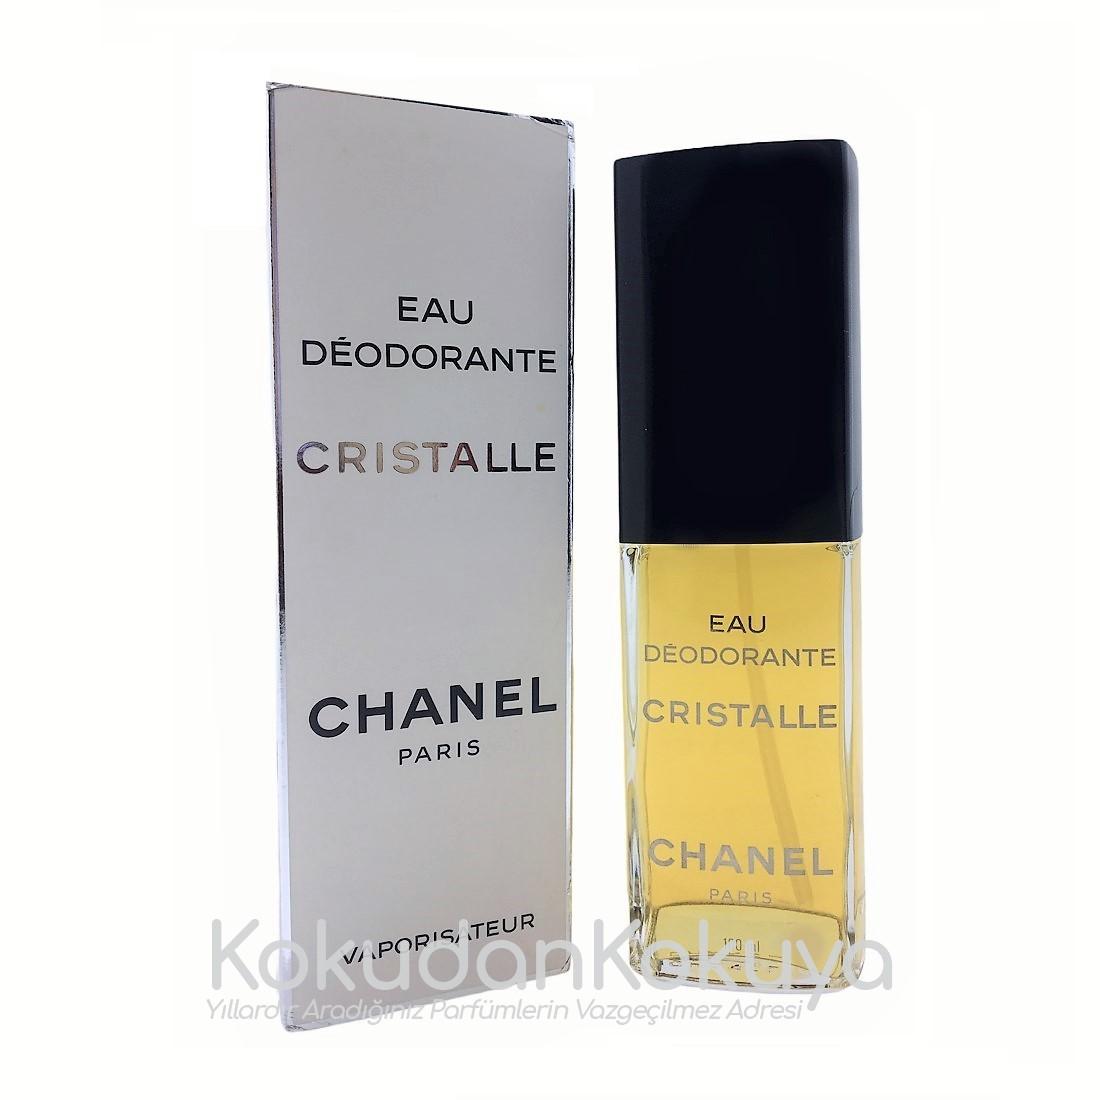 CHANEL Cristalle (Vintage) Deodorant Kadın 100ml Deodorant Spray (Cam) Sprey